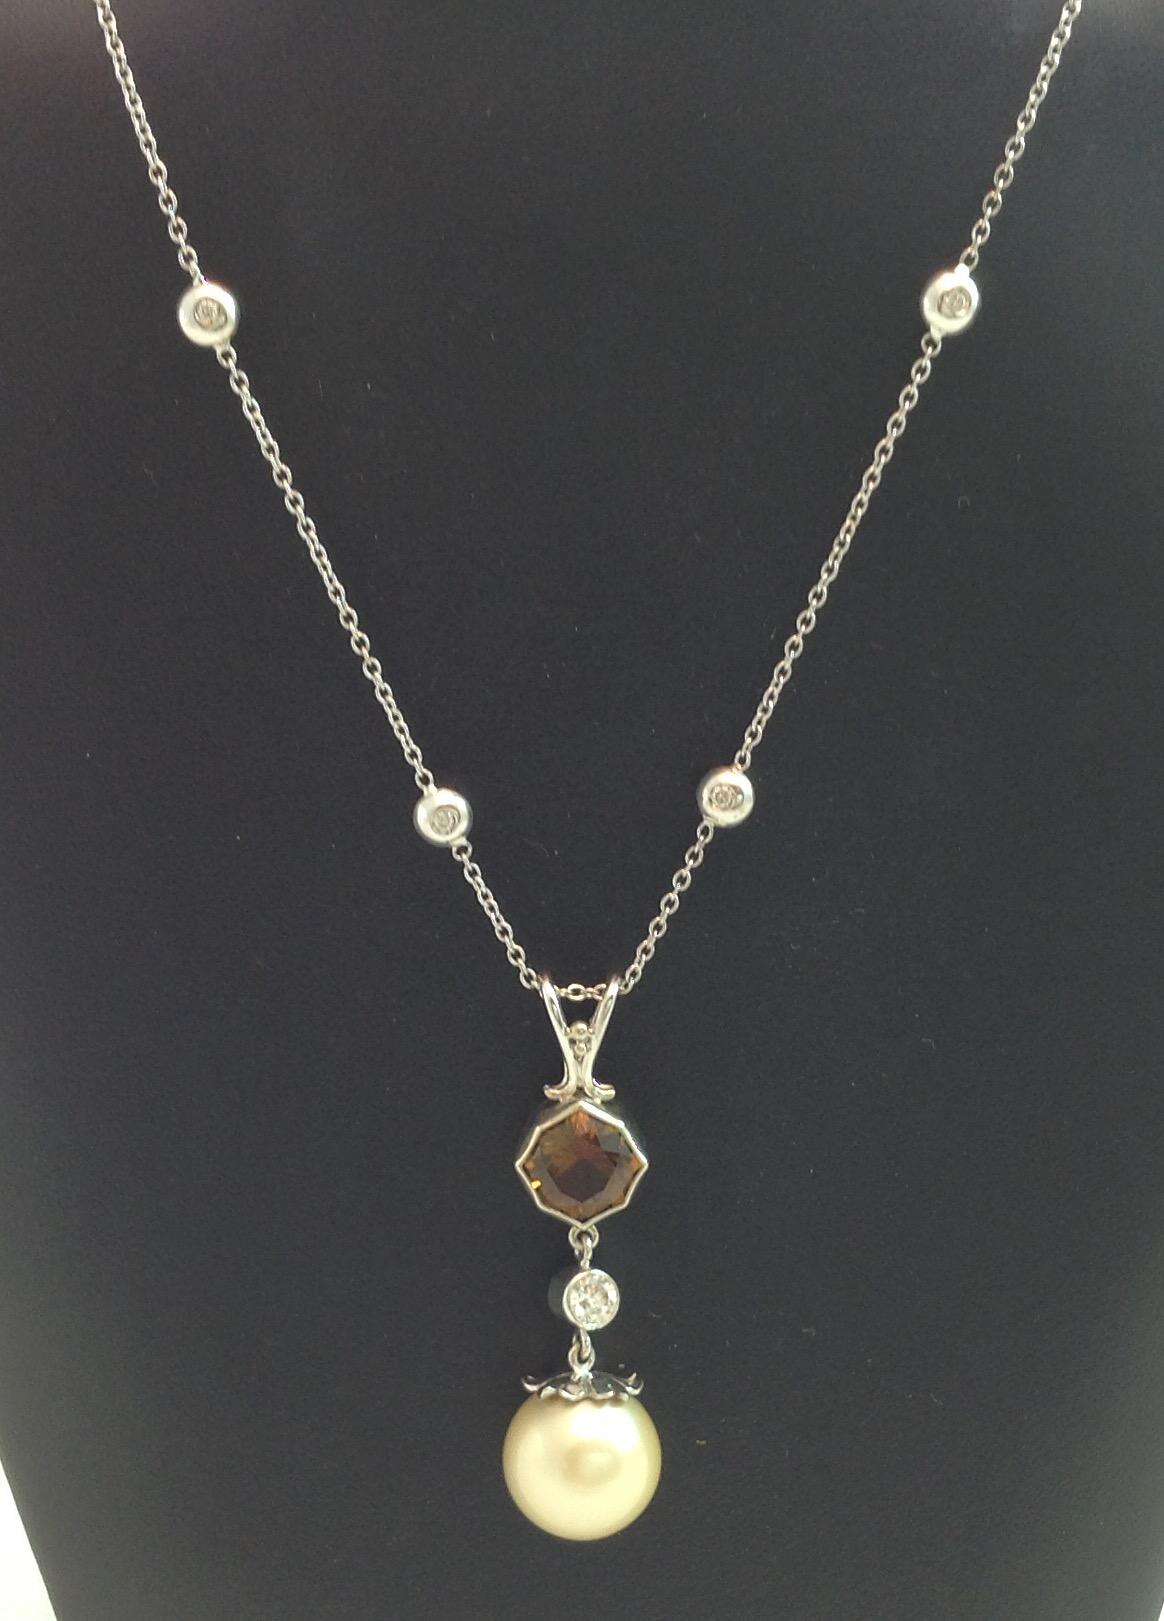 South Seas Pearl Pendant & Chain